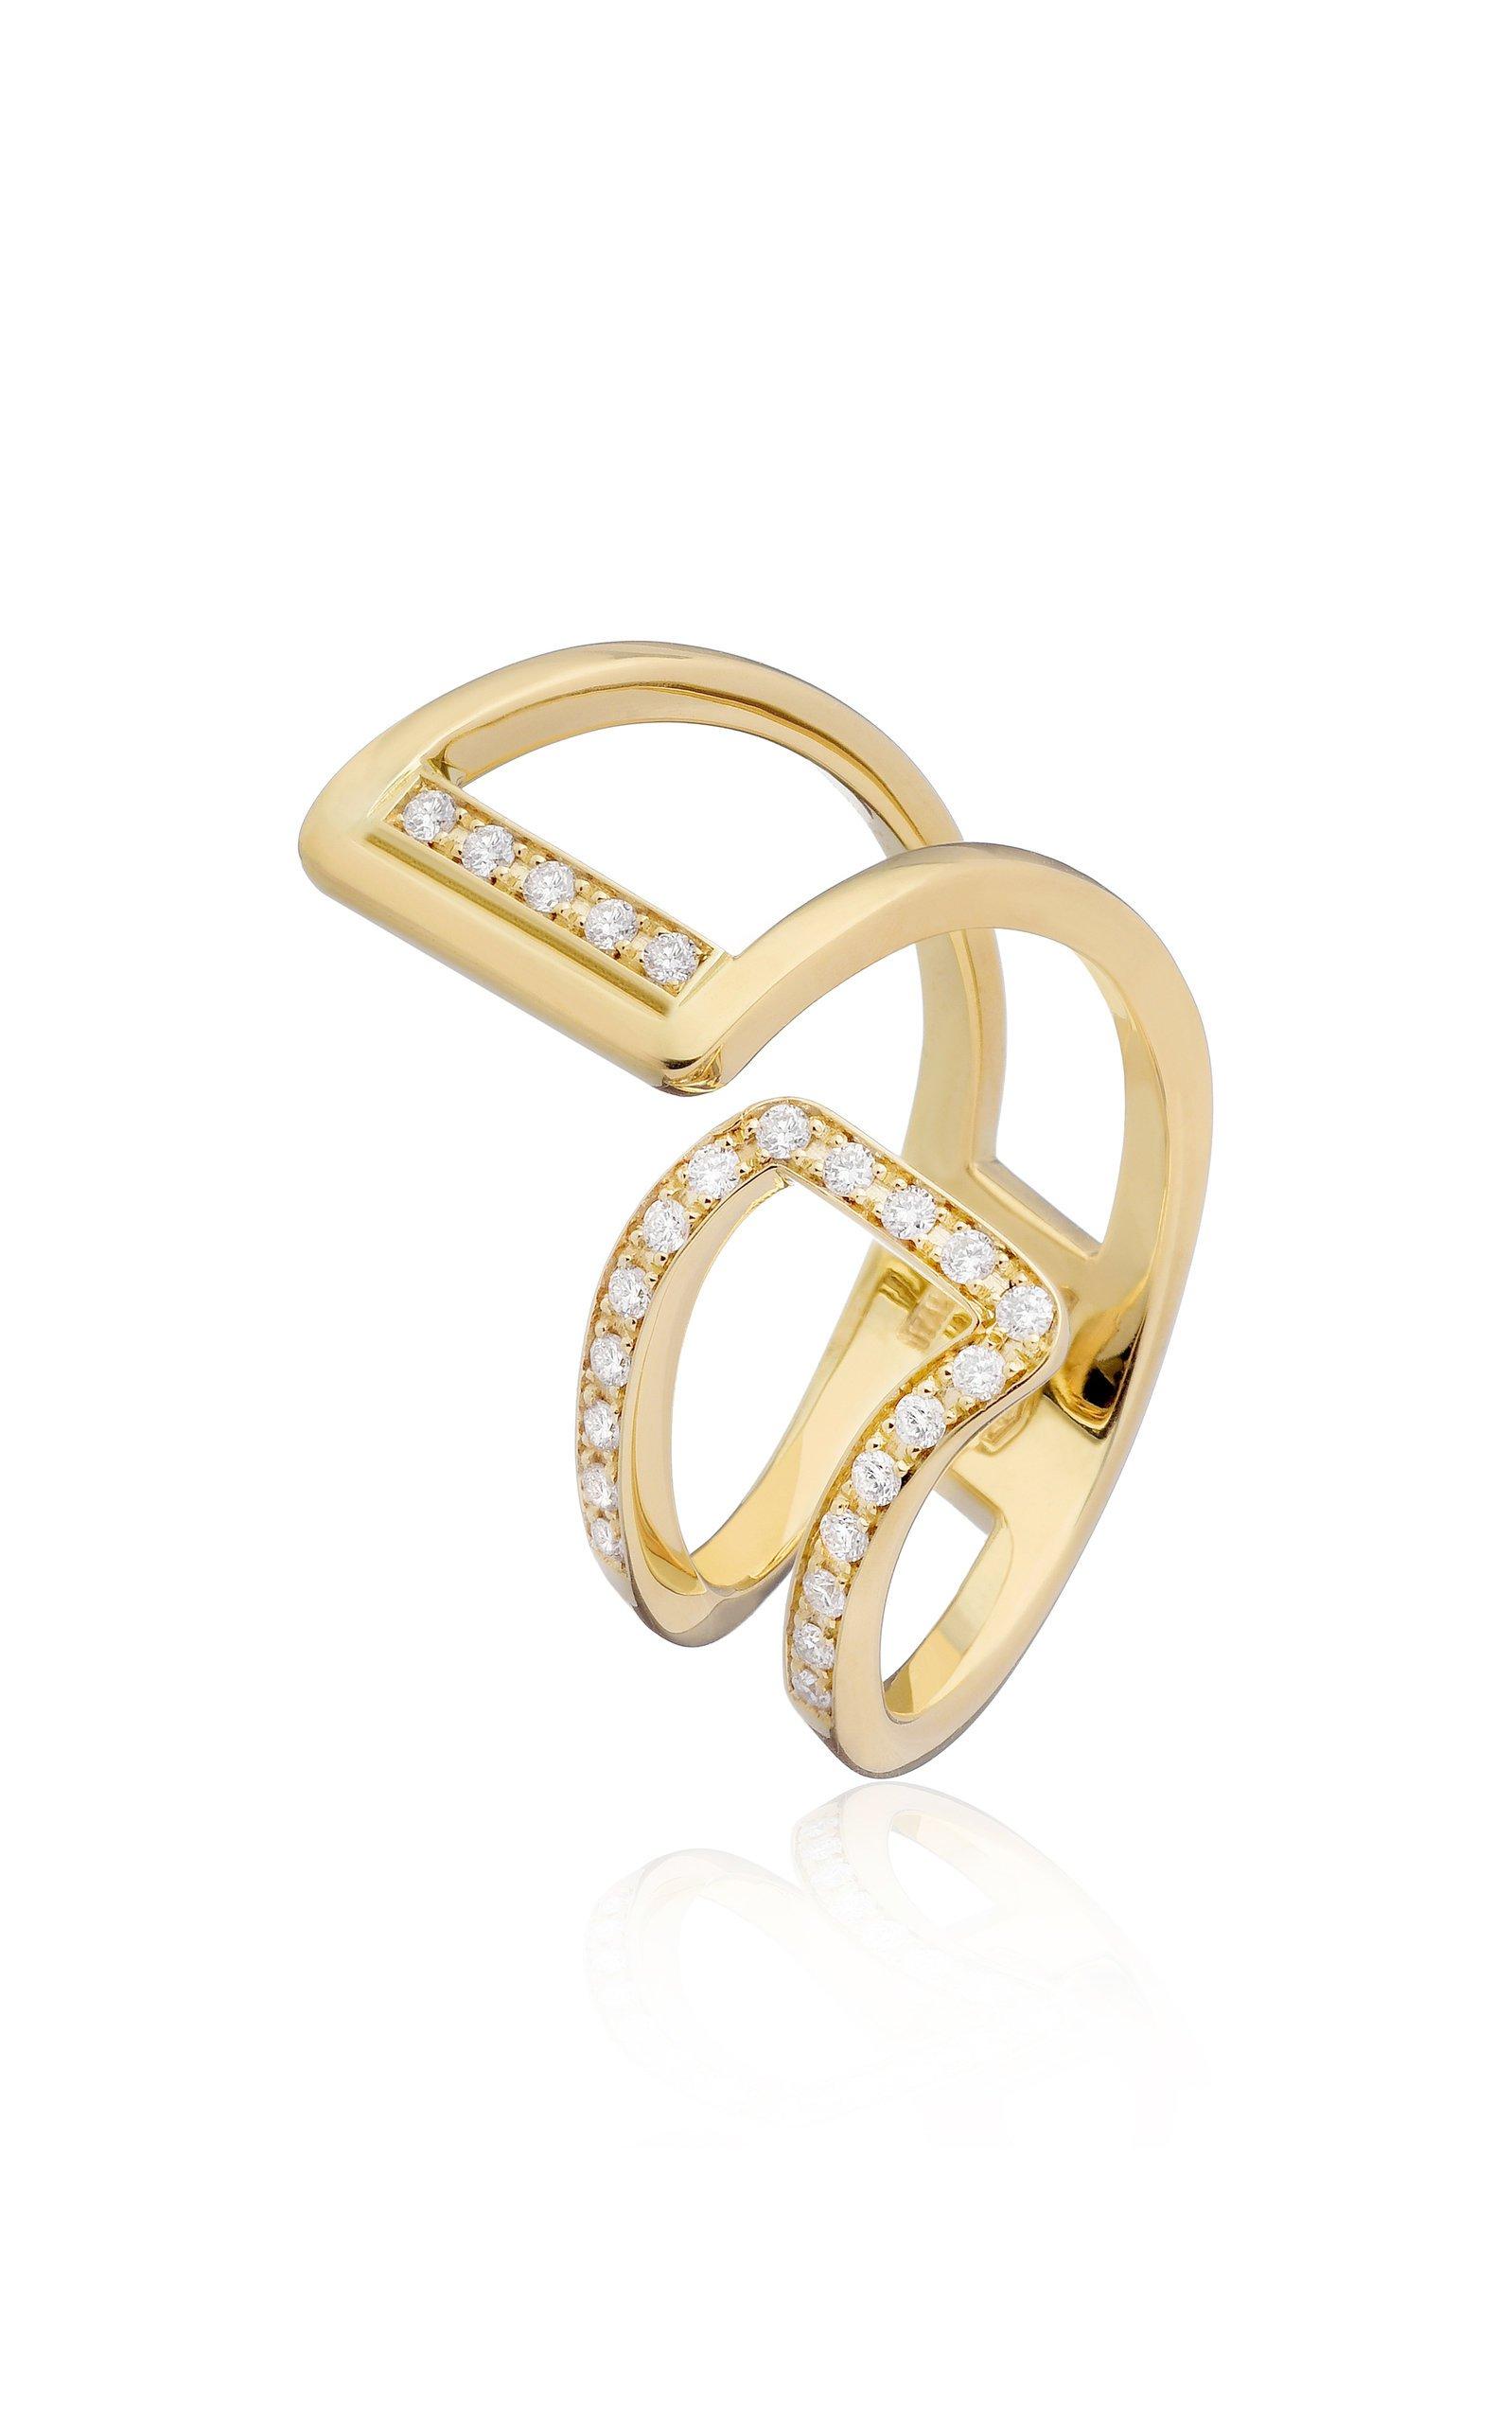 Eera Joelle Ring I